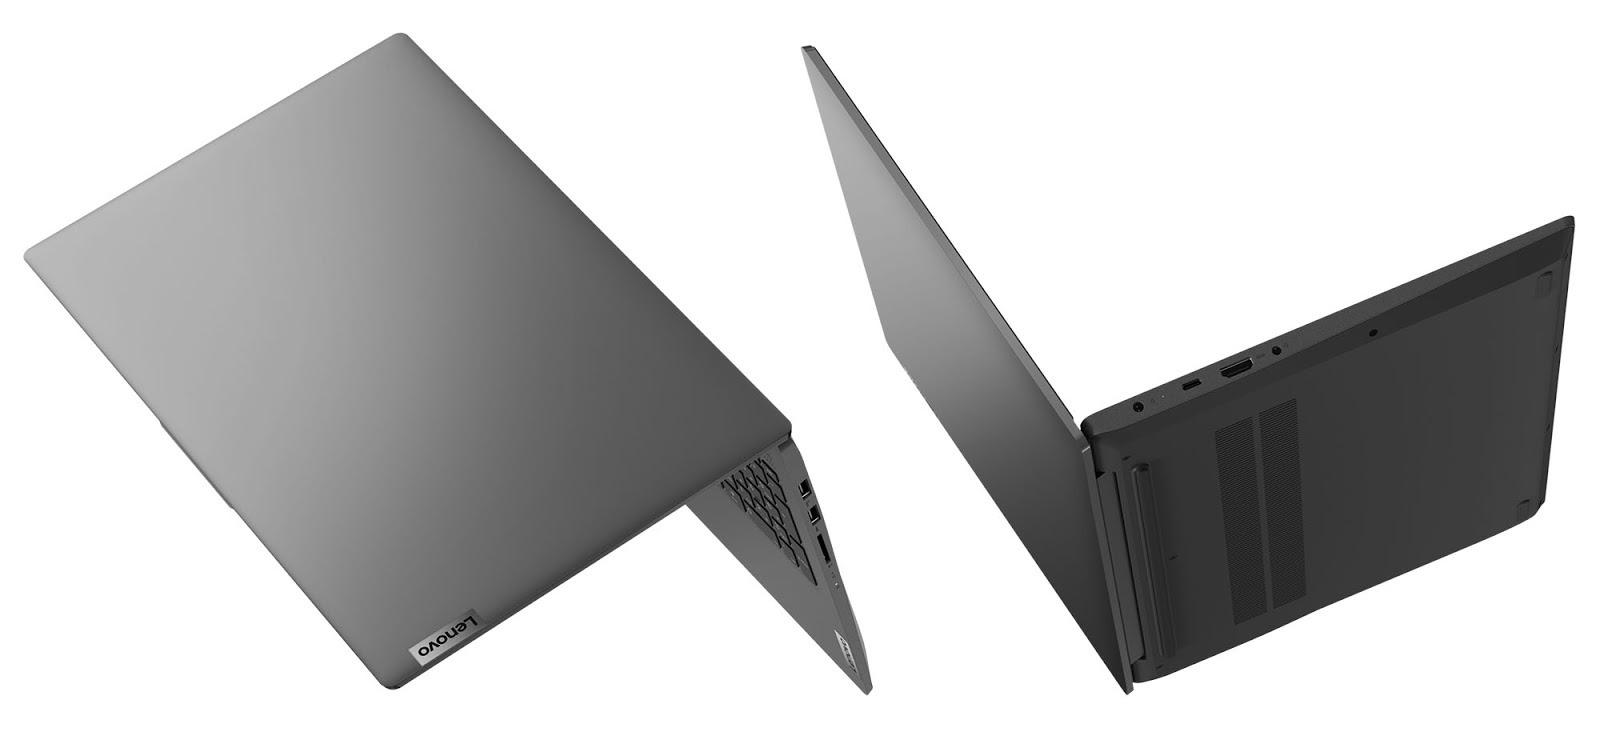 Фото 4. Ноутбук Lenovo ideapad 5-15IIL05 Graphite Grey (81YK006HRE)